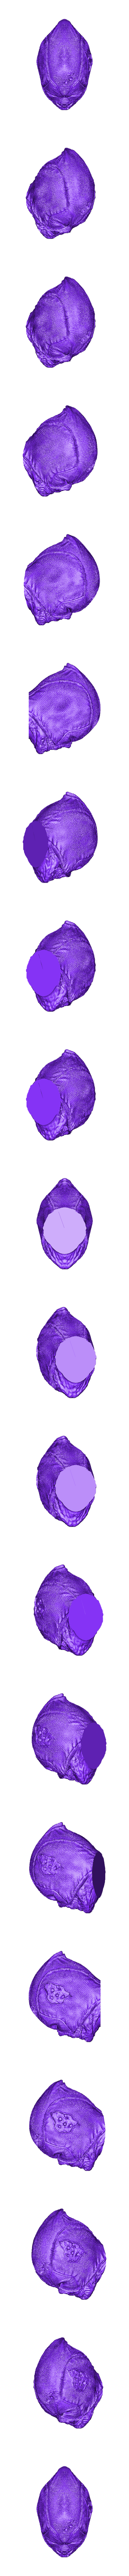 Solid_Part(no_hollow).stl Descargar archivo OBJ Zombie Deadpool • Objeto imprimible en 3D, tolgaaxu